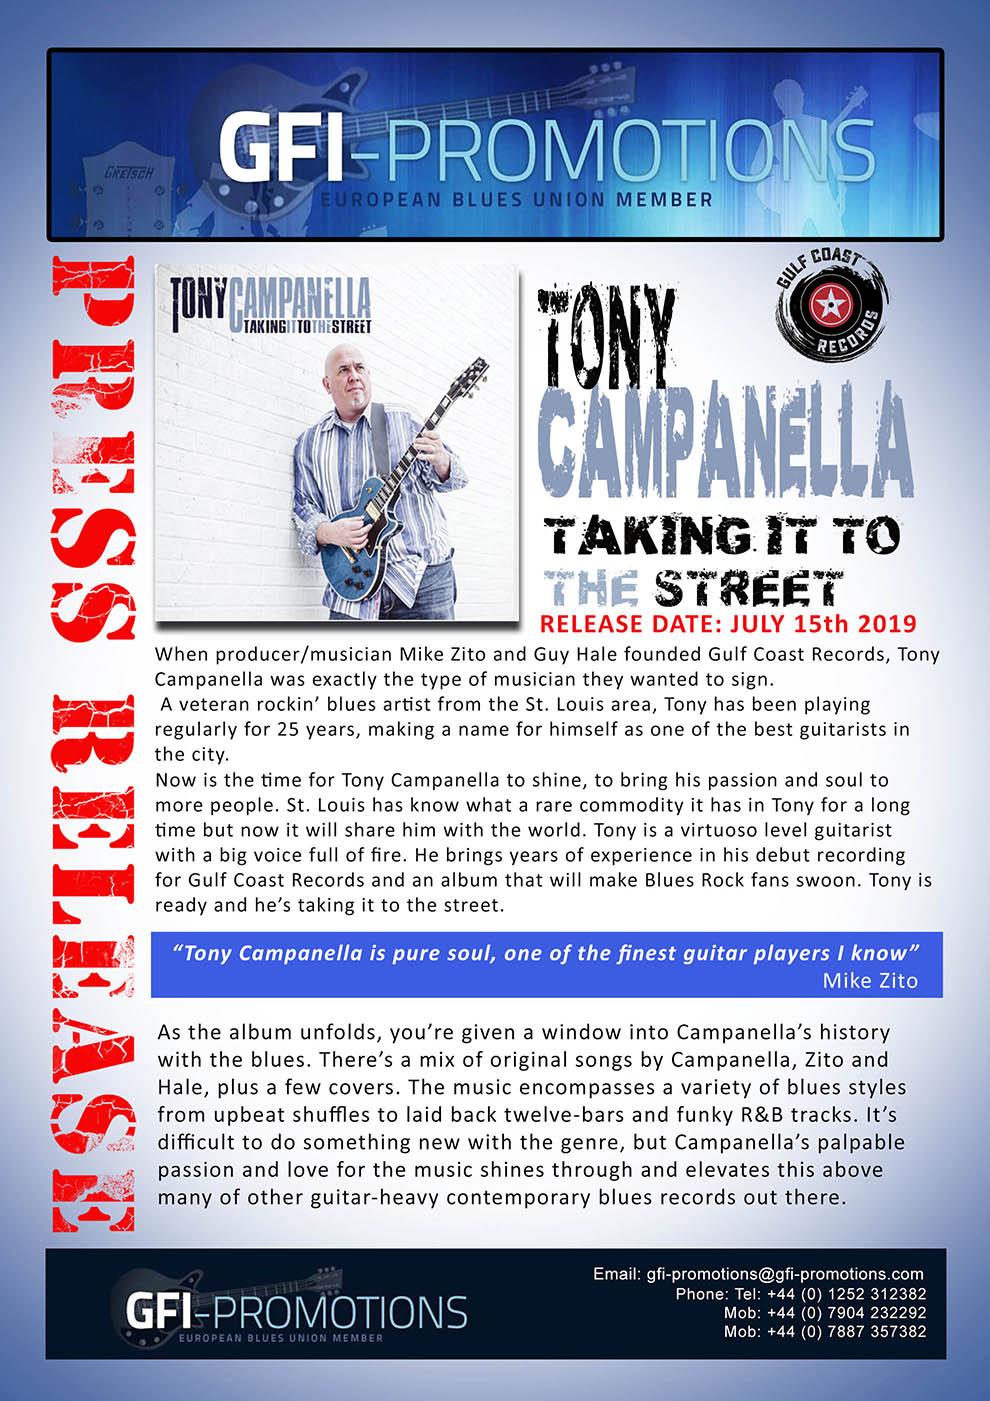 Tony Campanella